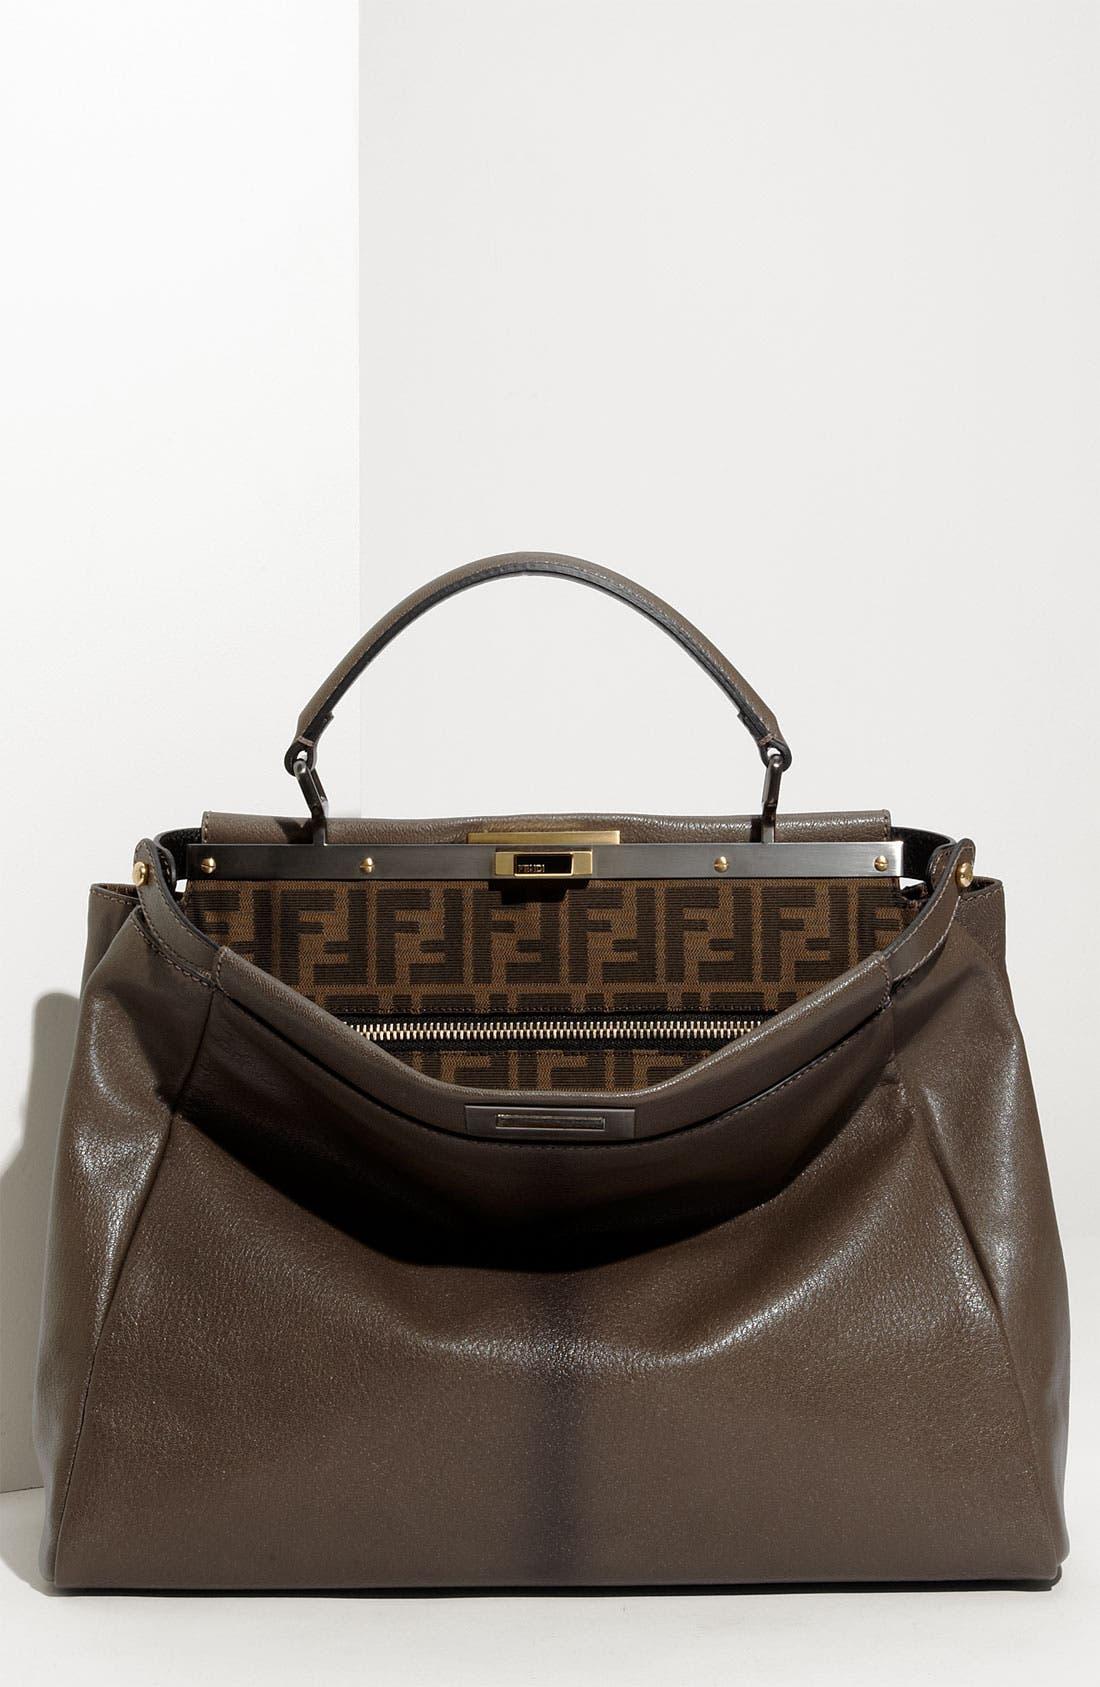 Alternate Image 1 Selected - Fendi 'Peekaboo - Large' Leather Satchel